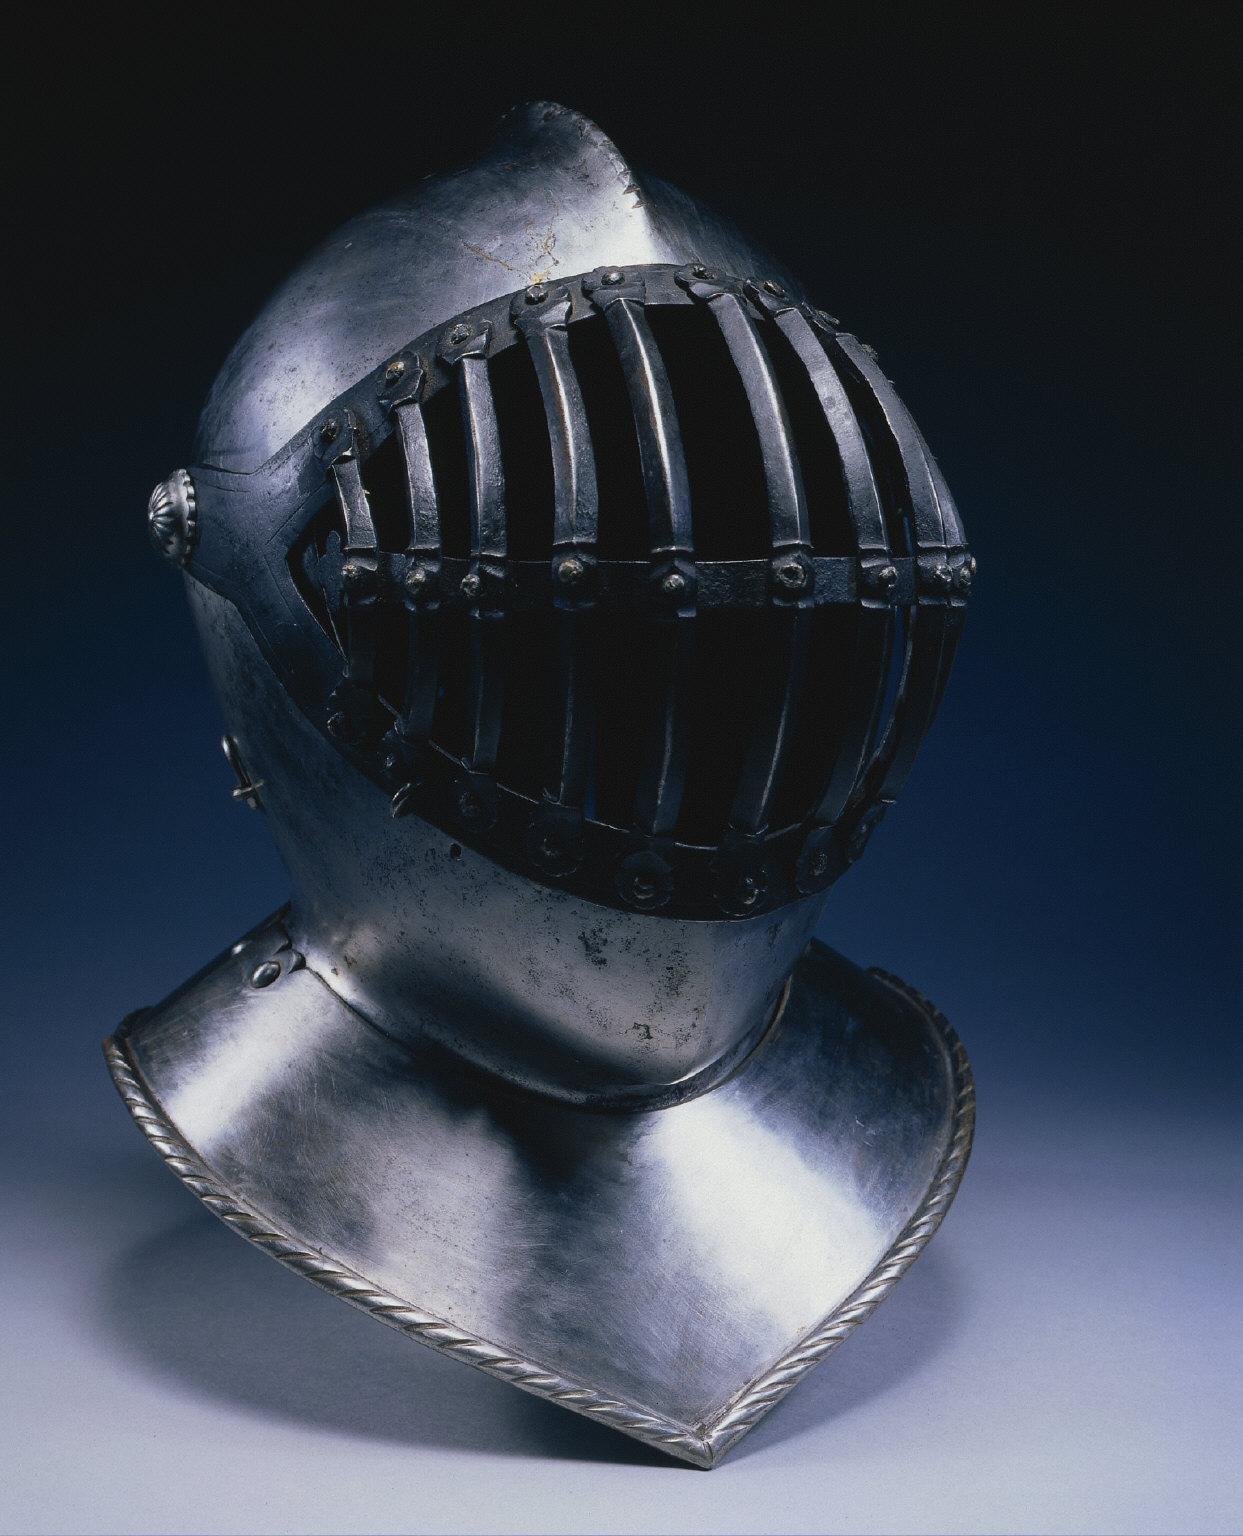 Helmet with Barred Visor